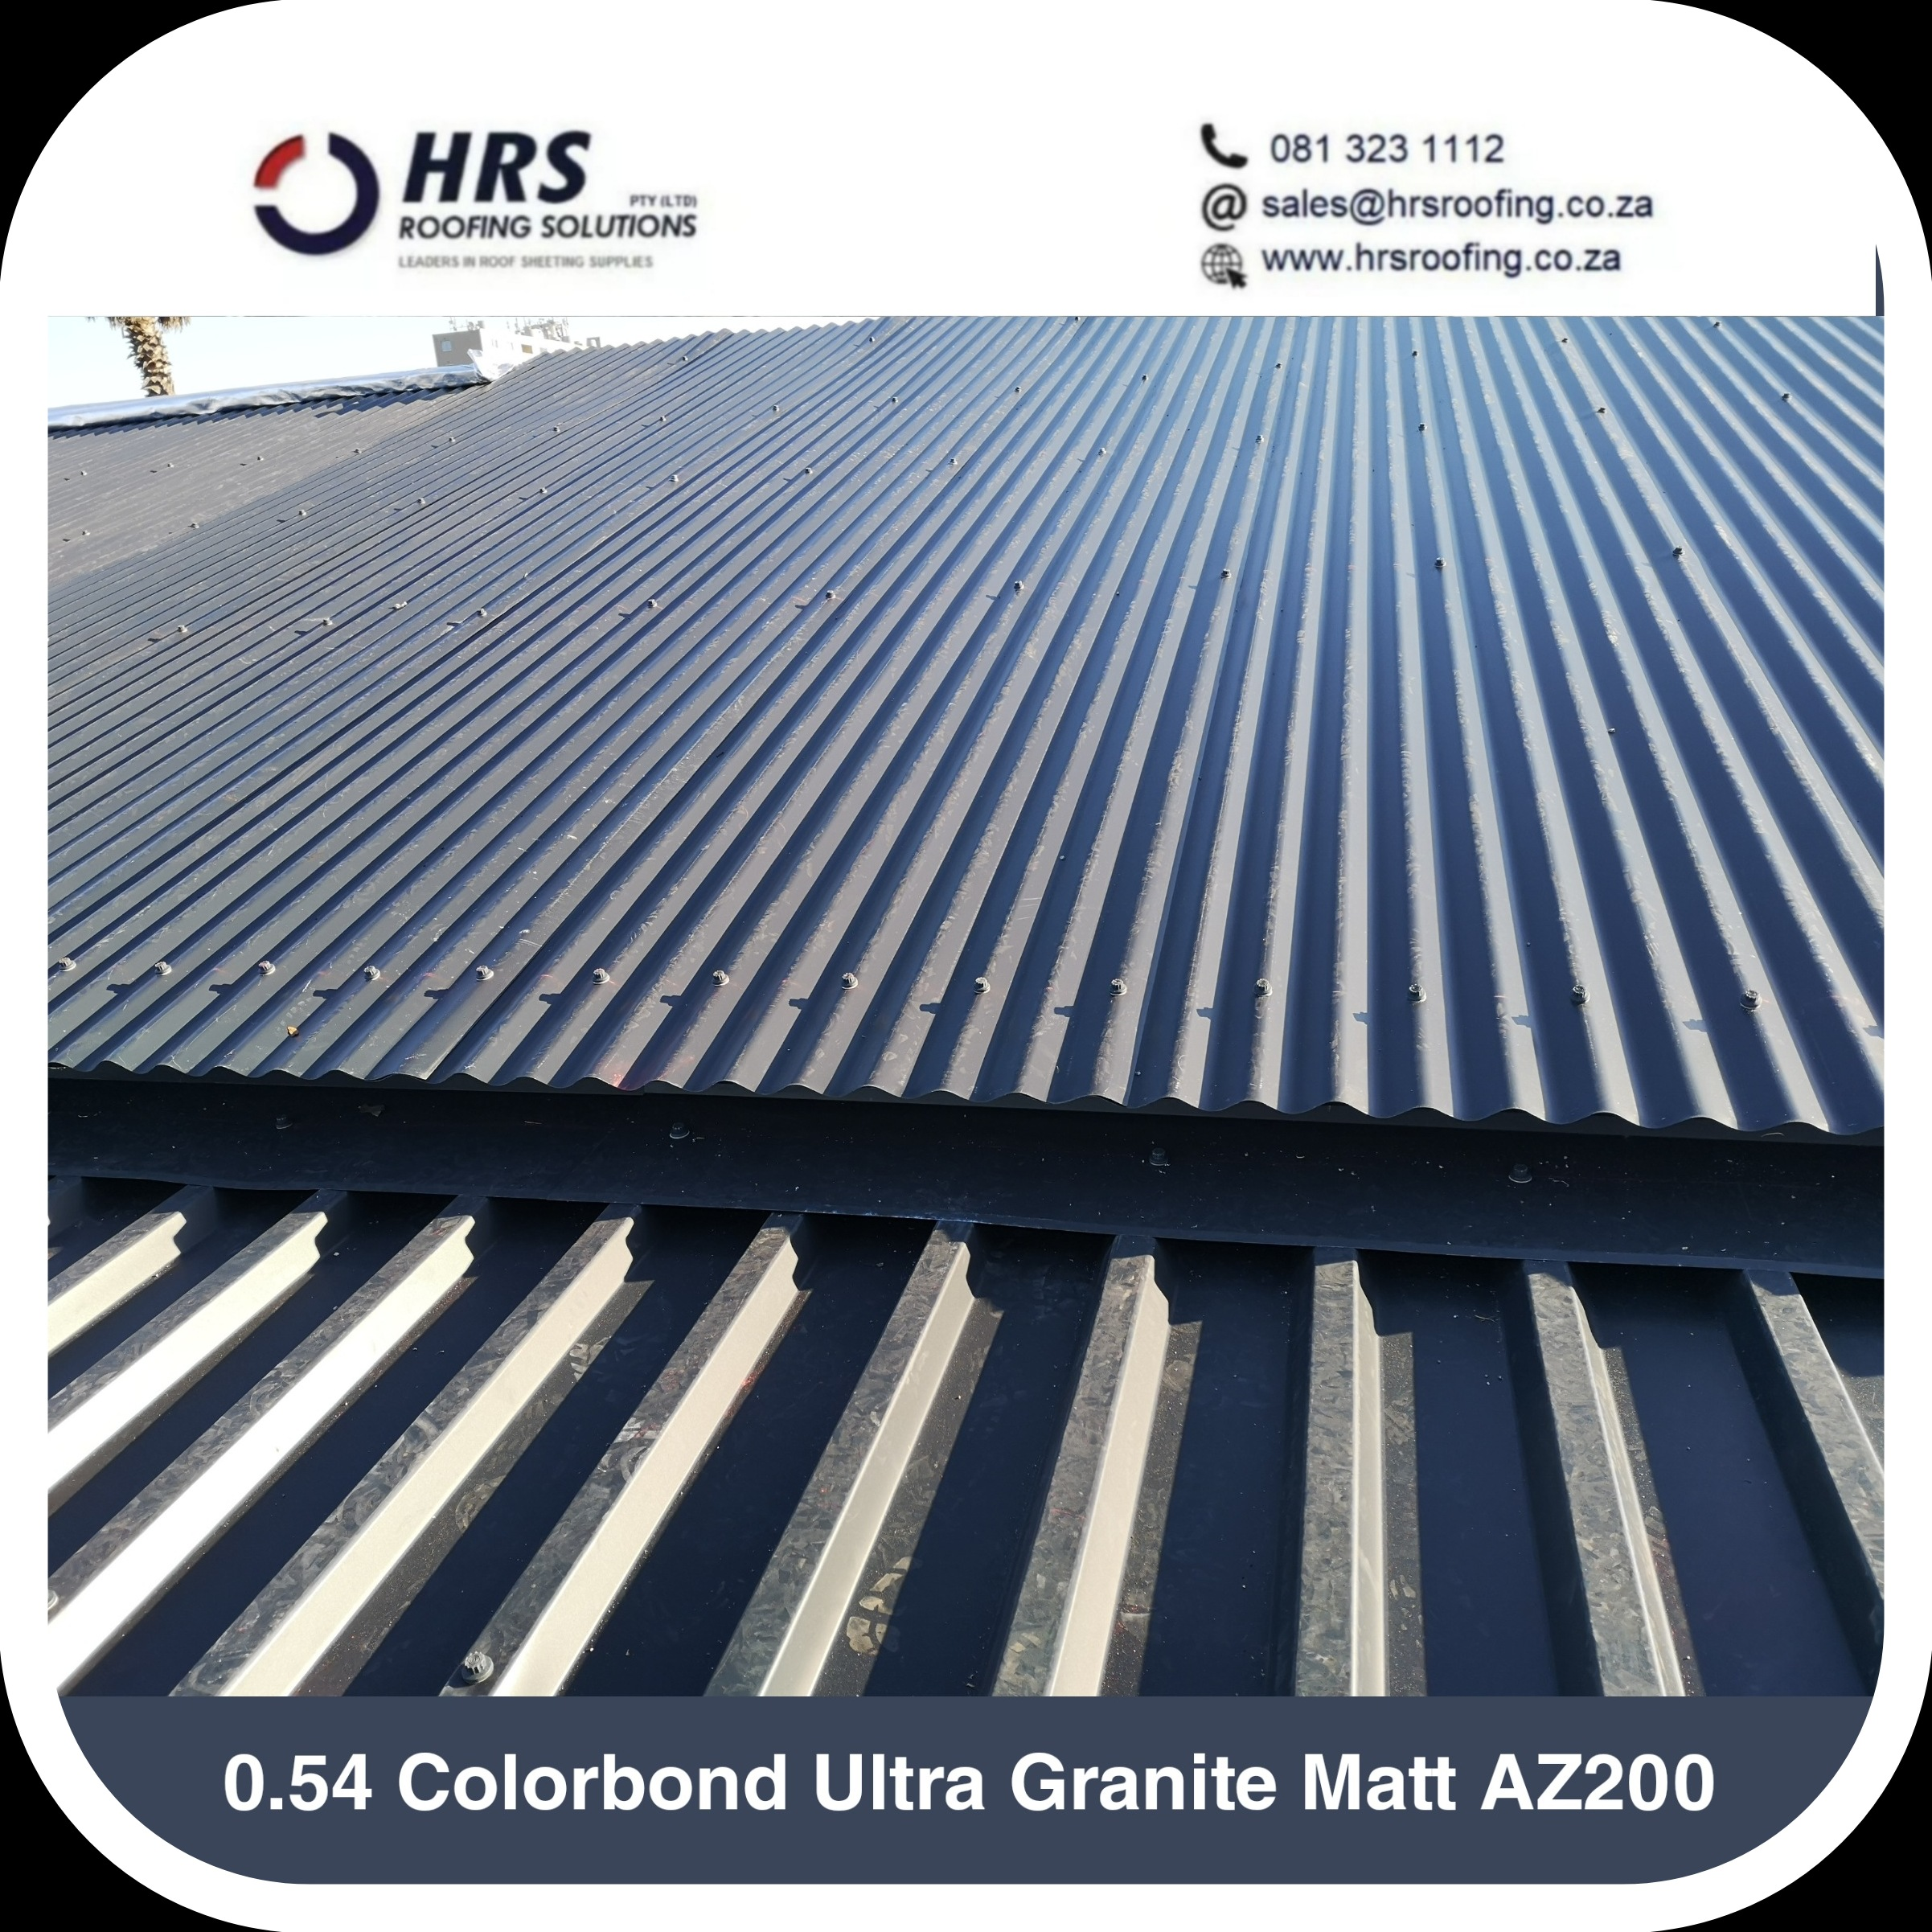 hrs roofing Colorbond matt granite matt roof sheeting supplier laaiplek